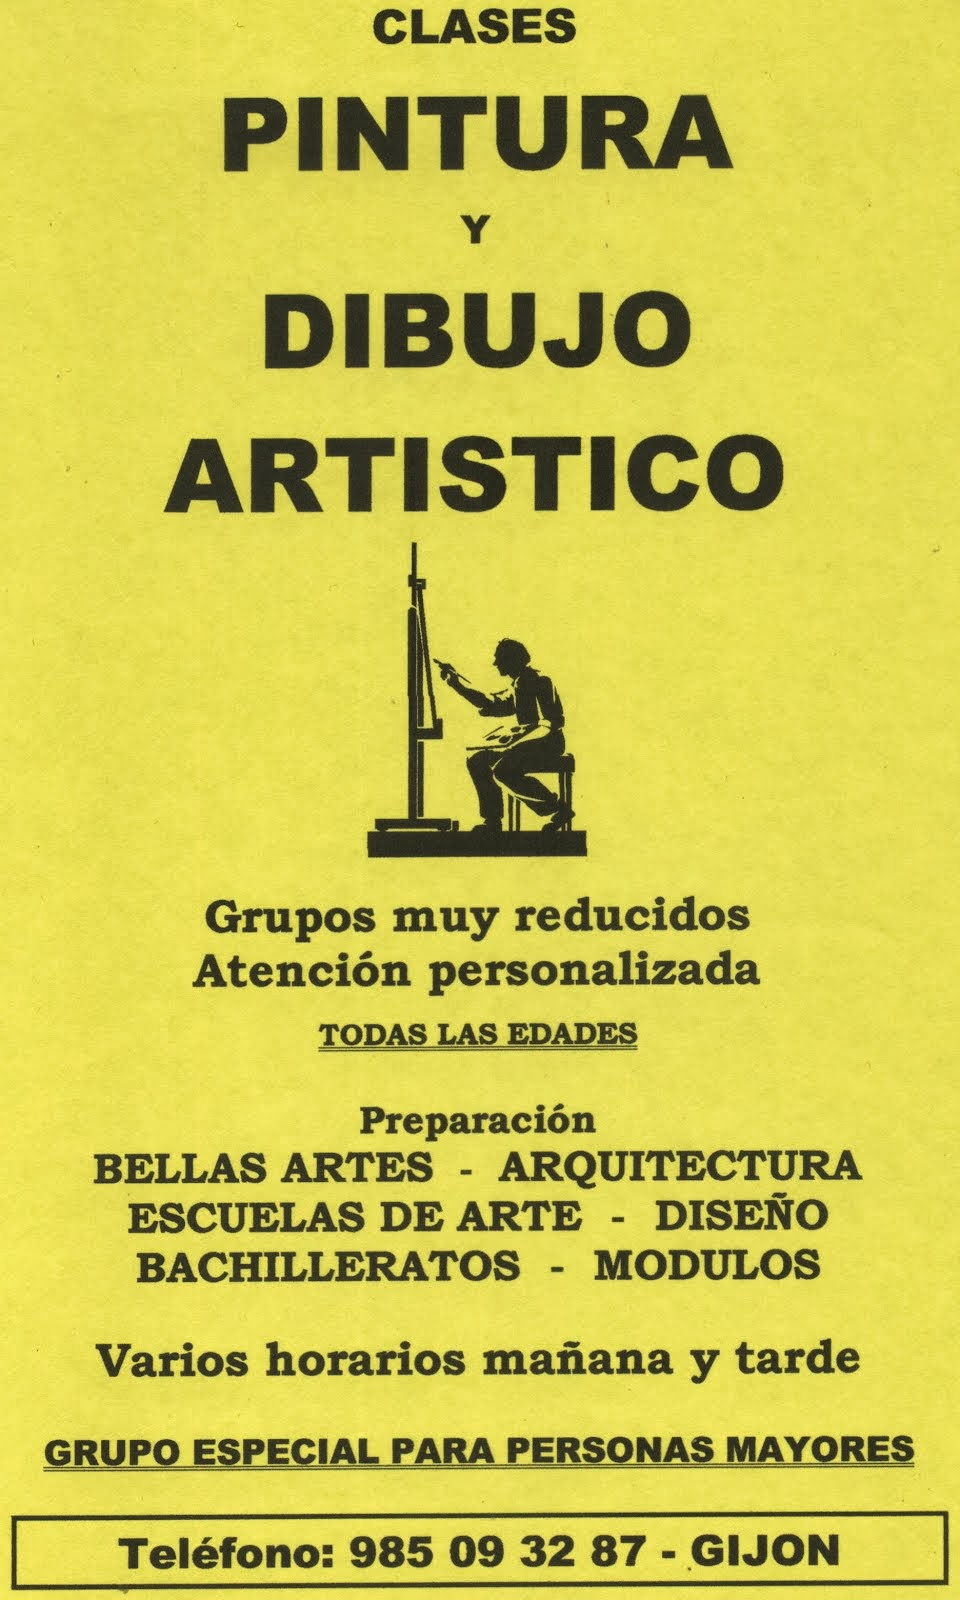 CLASES DE DIBUJO Y PINTURA EN GIJON